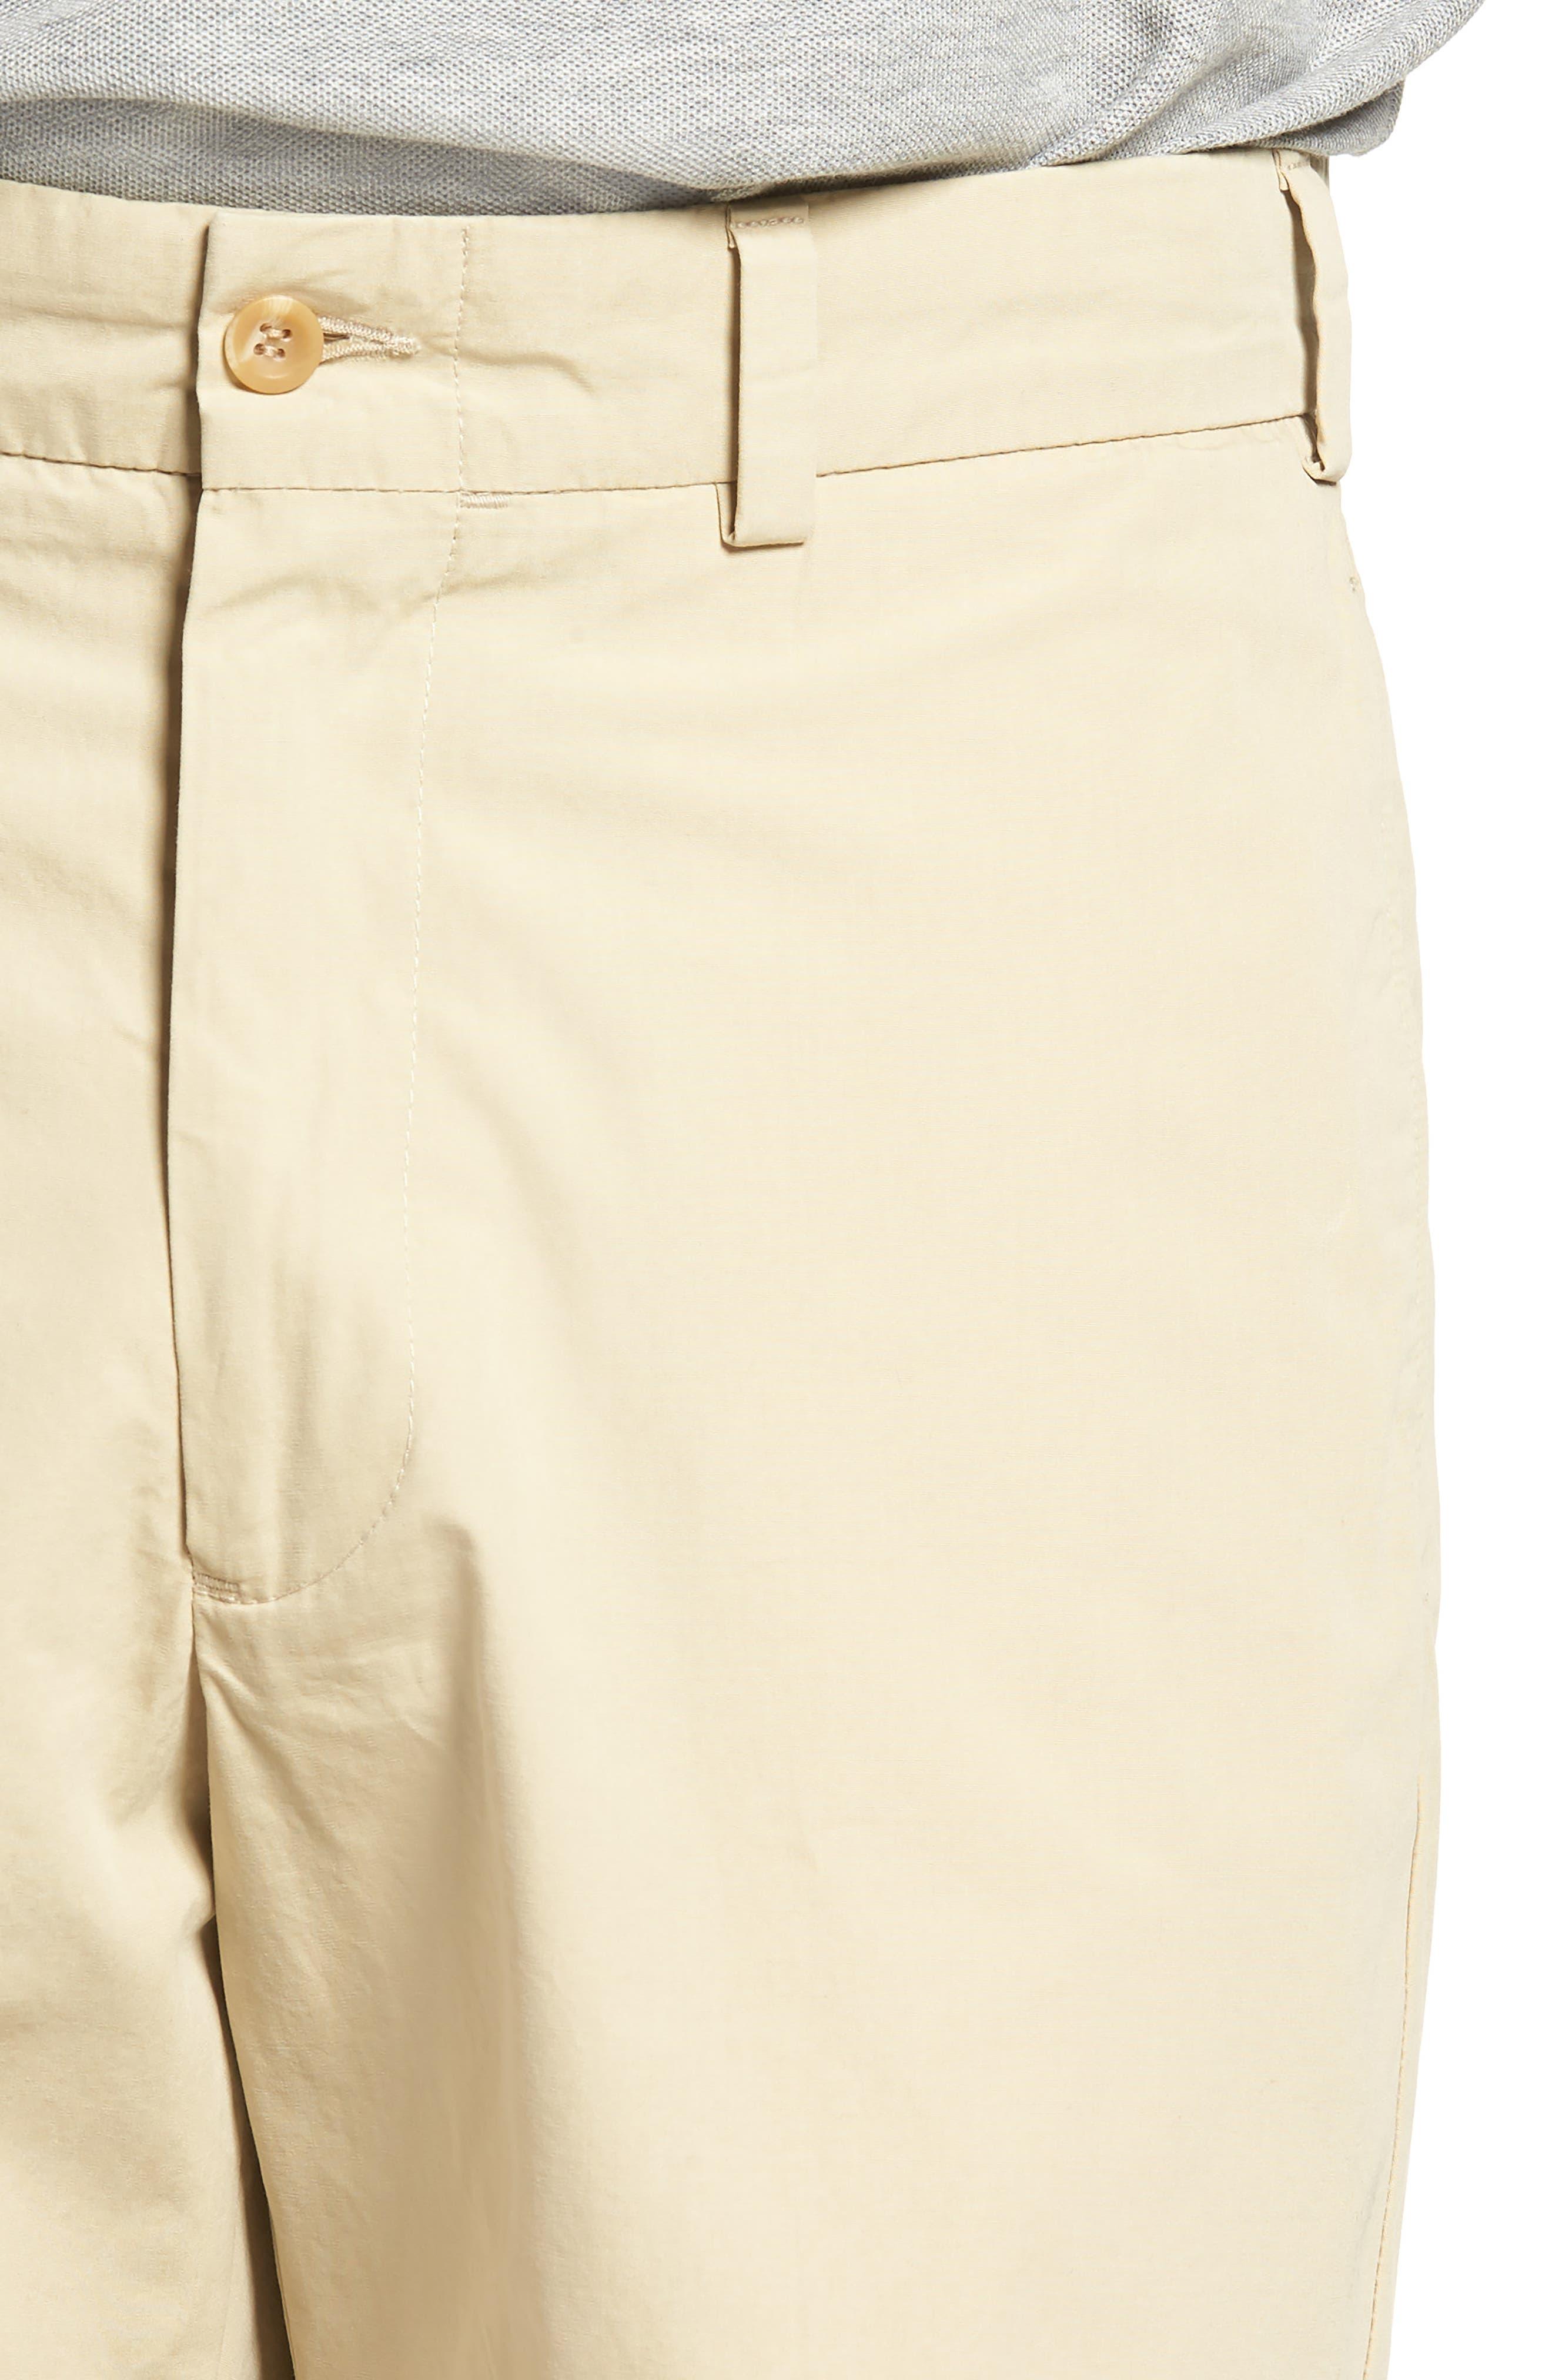 M2 Classic Fit Flat Front Tropical Cotton Poplin Shorts,                             Alternate thumbnail 4, color,                             Khaki